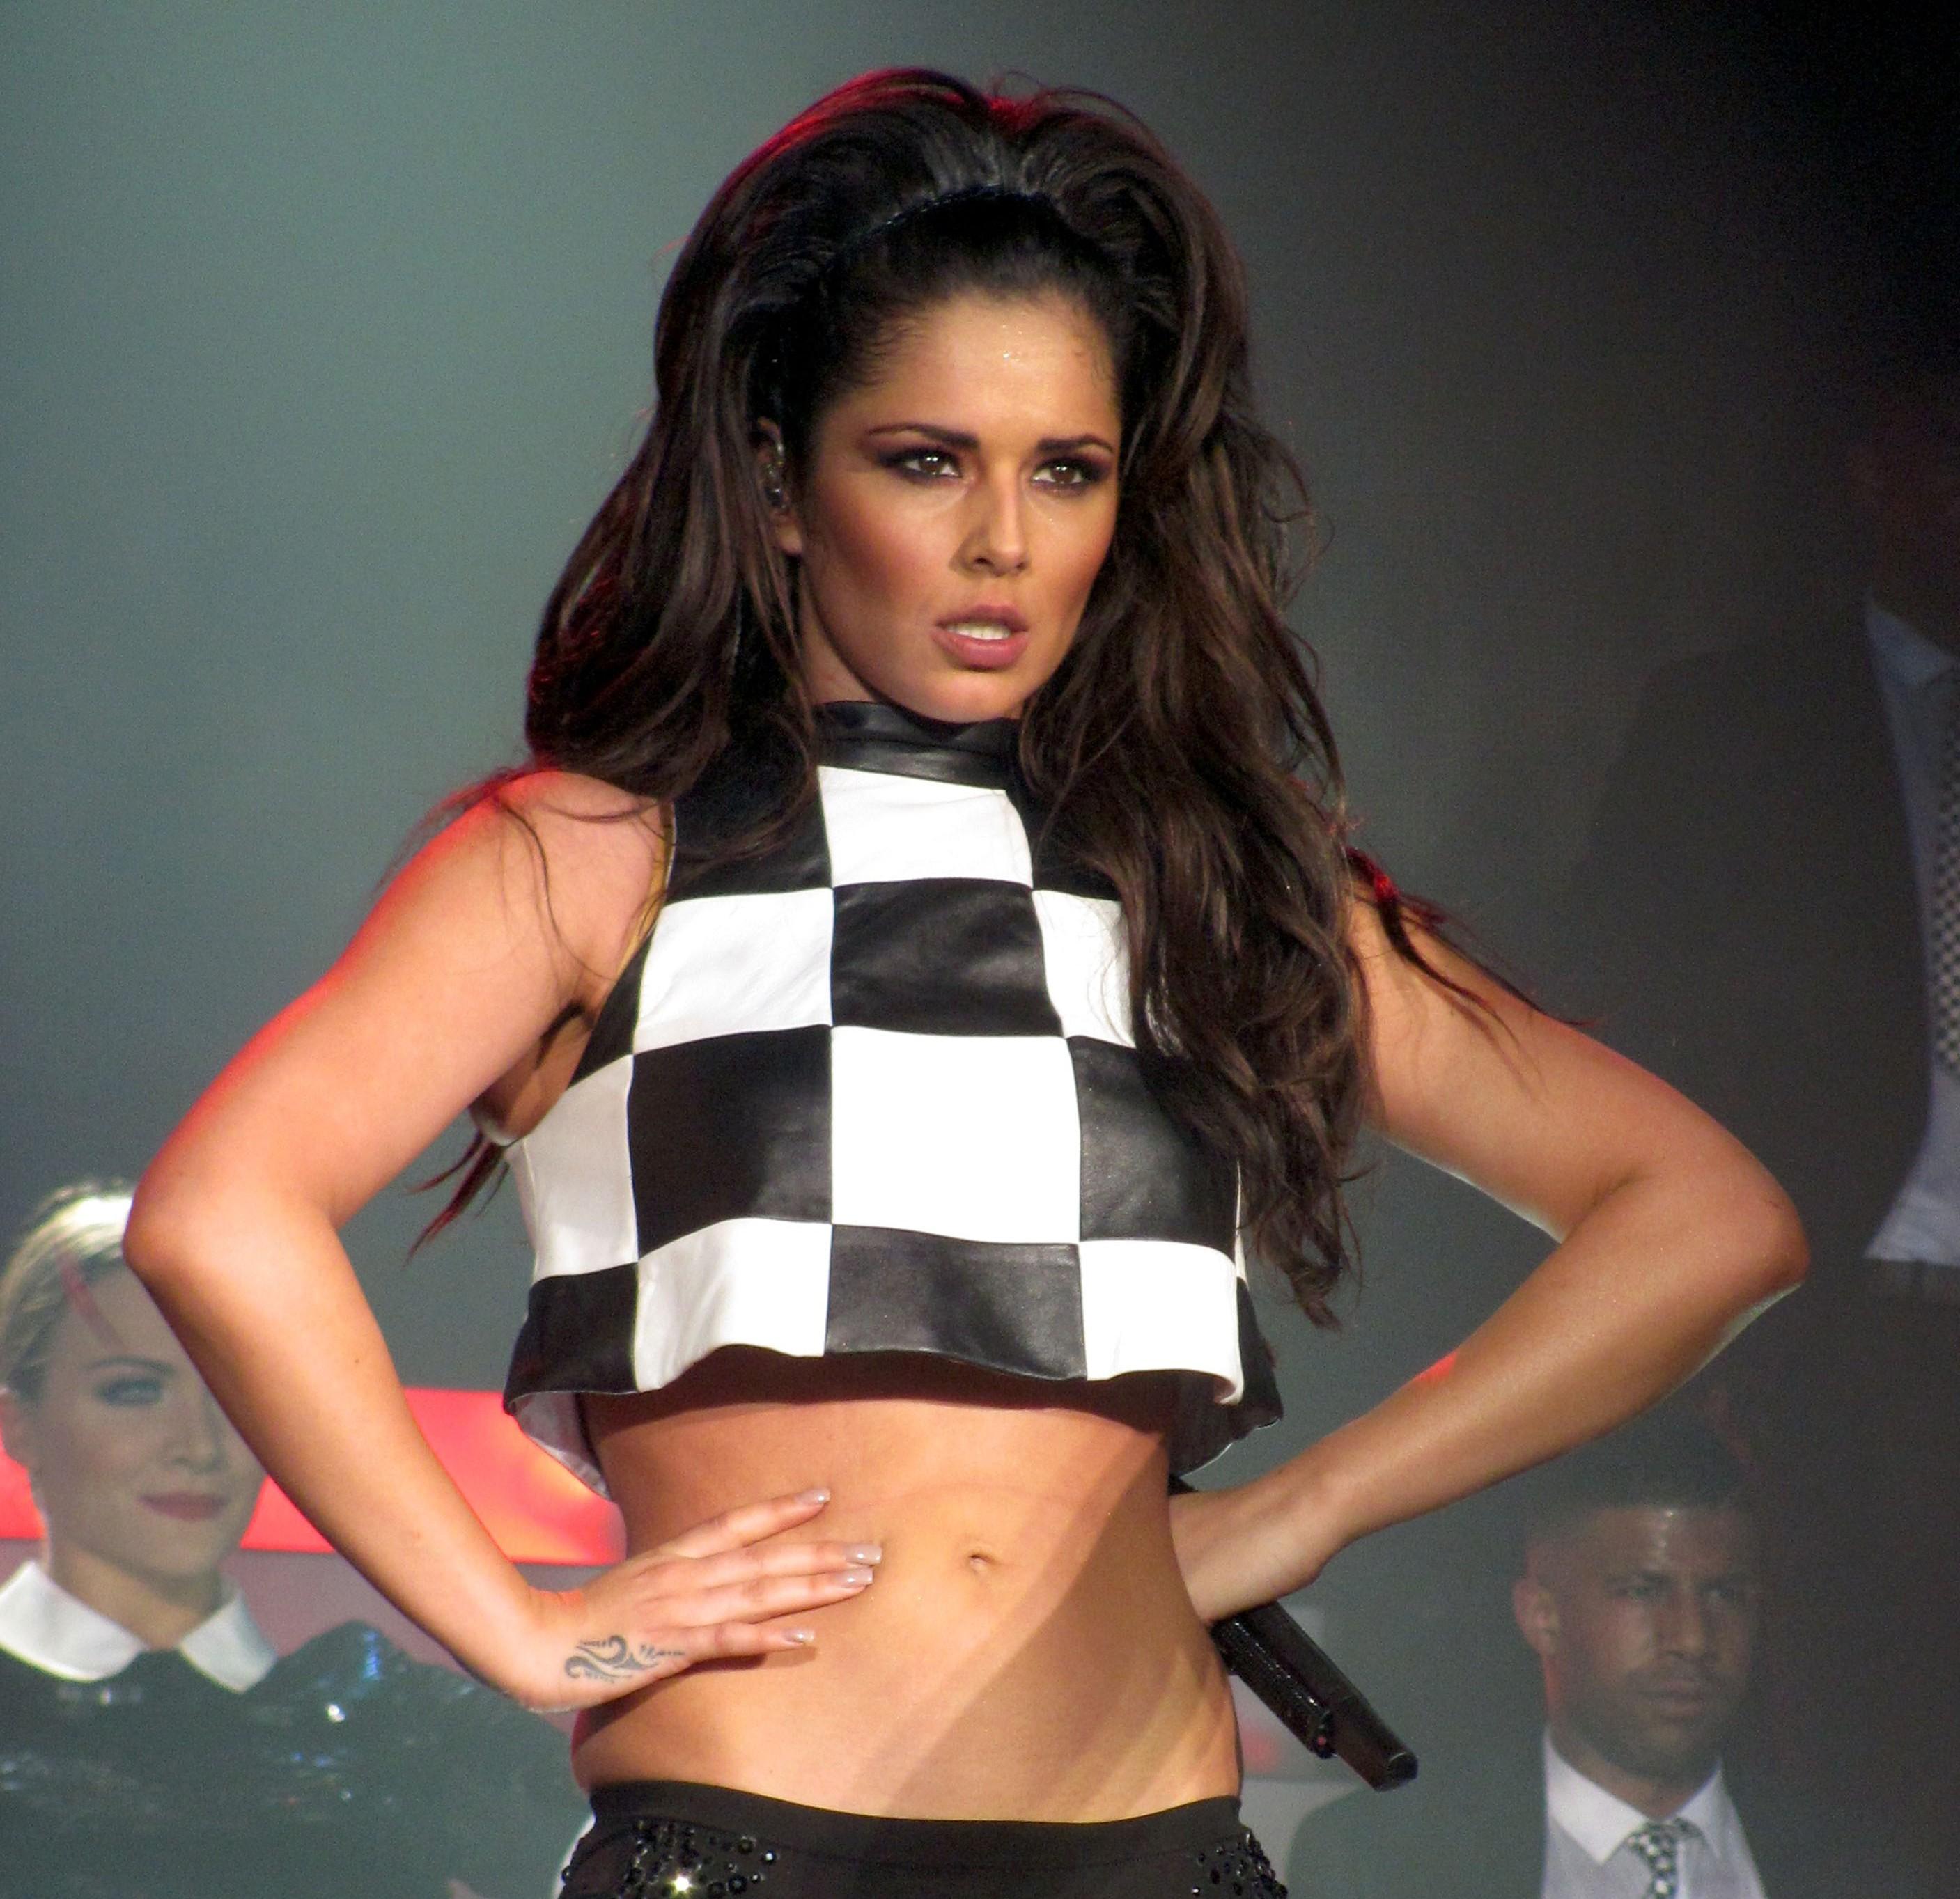 Cheryl Cole rants over latest Ashley Cole sex claims